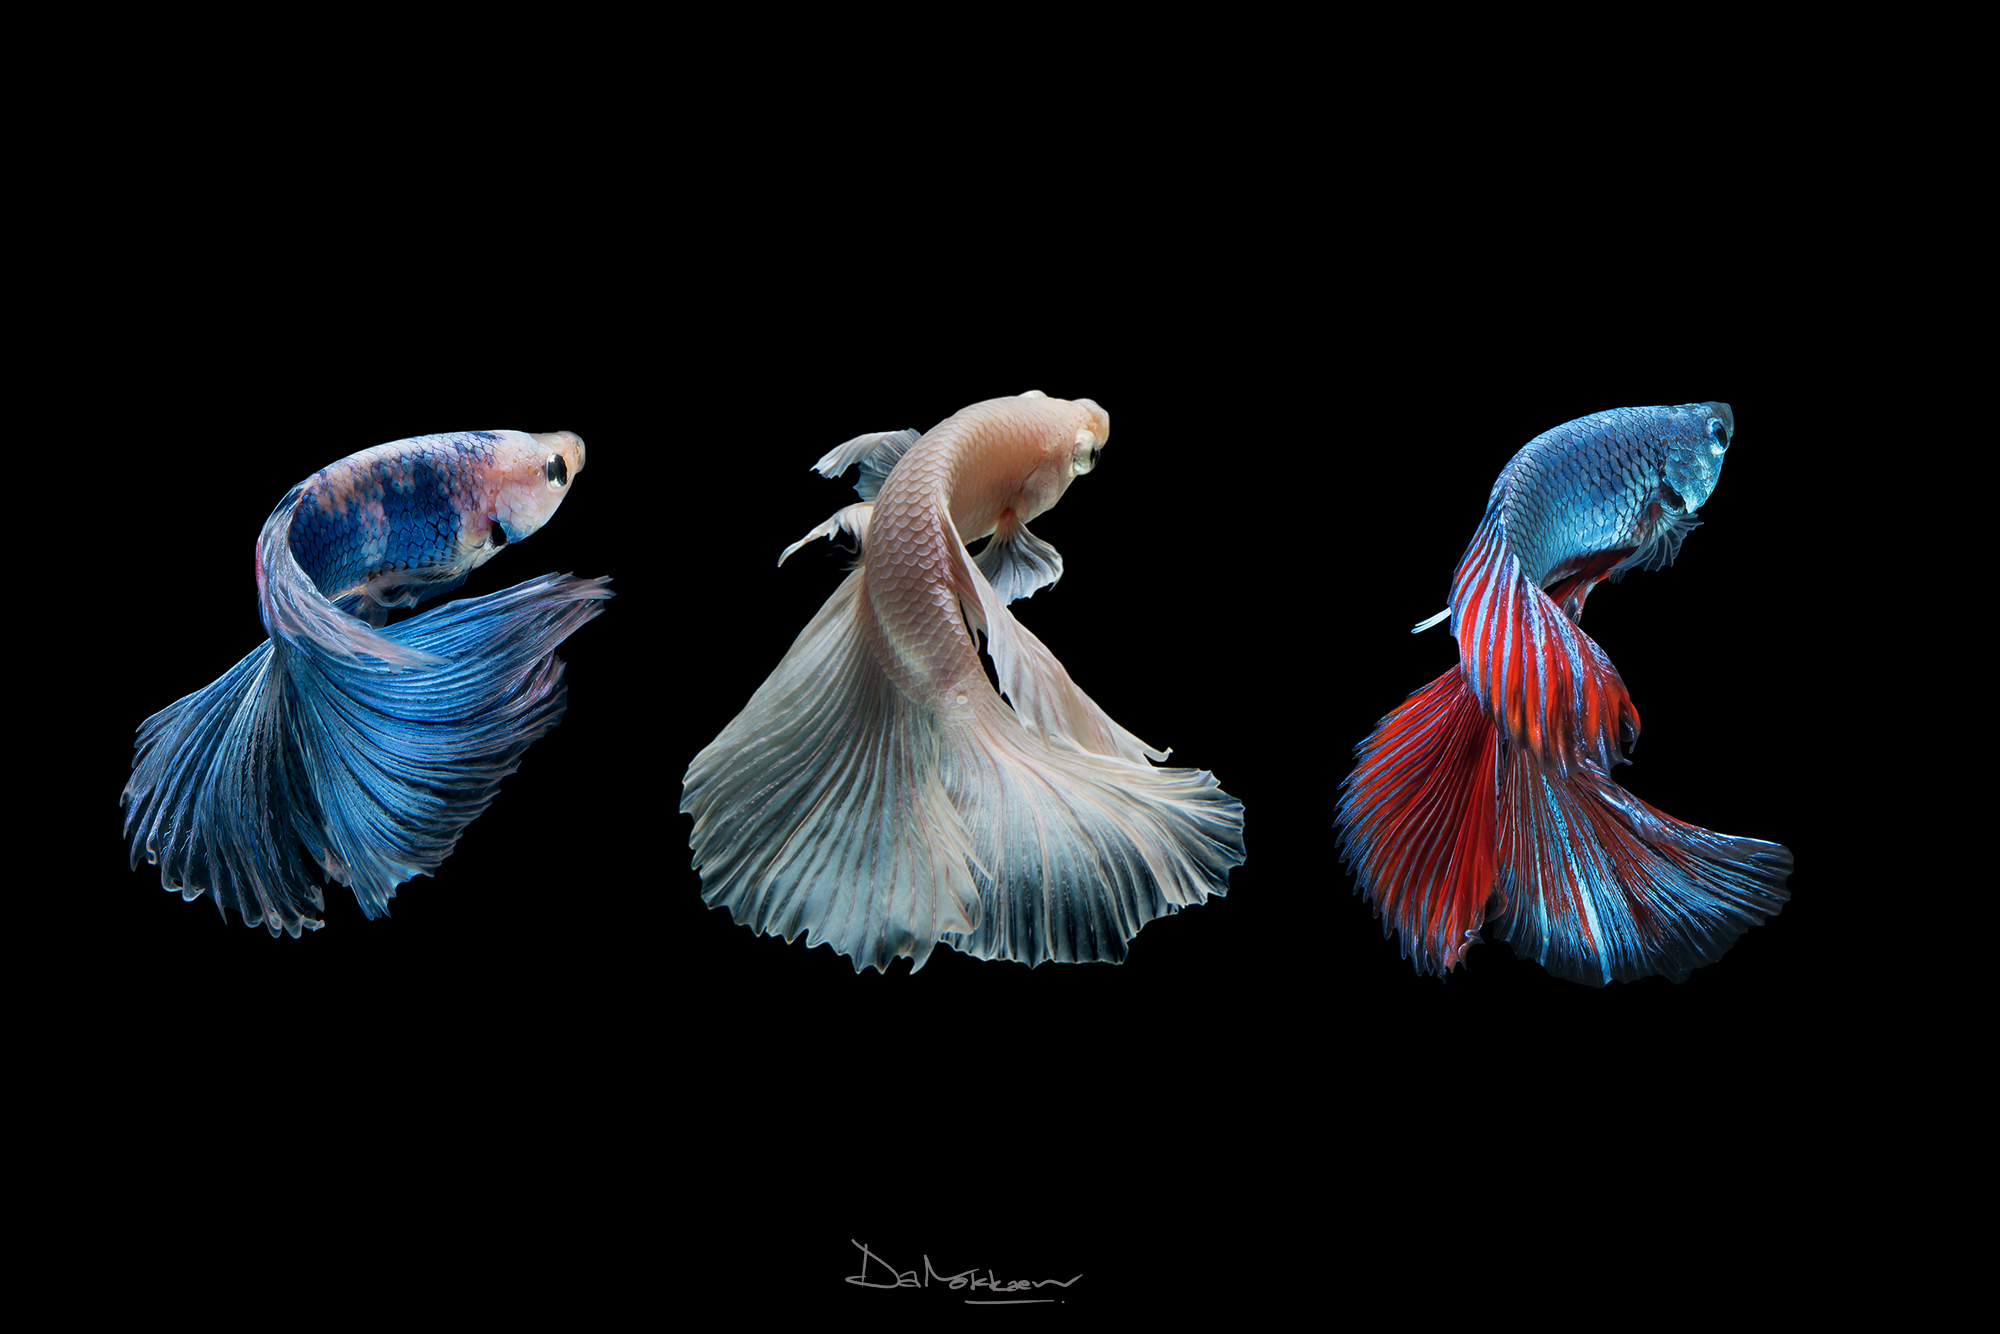 Three fish representing something surreal